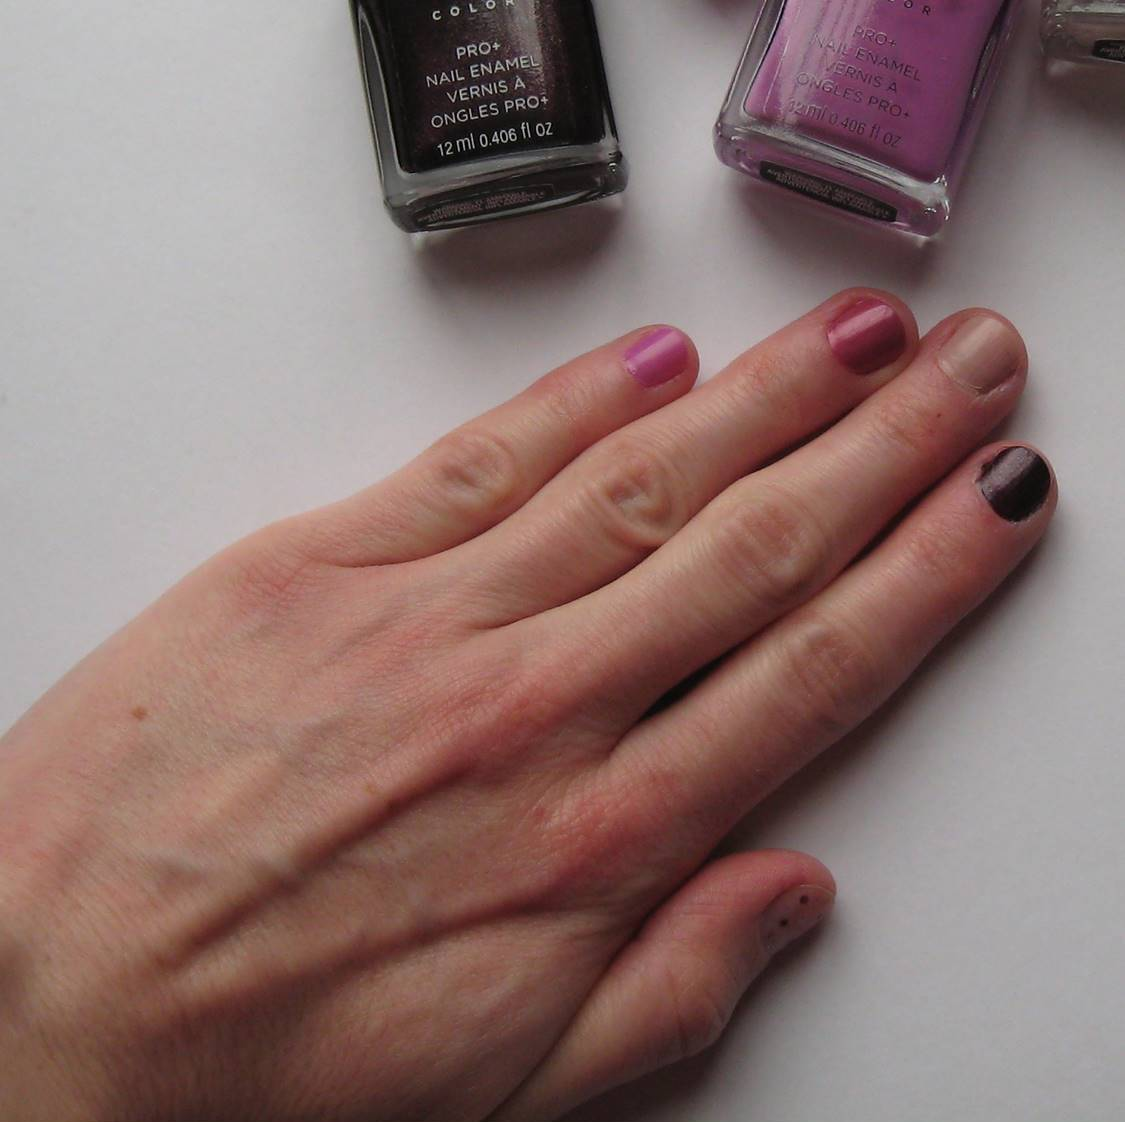 Erica\'s Fashion & Beauty: Avon True Color Pro+ Nail Enamel Review